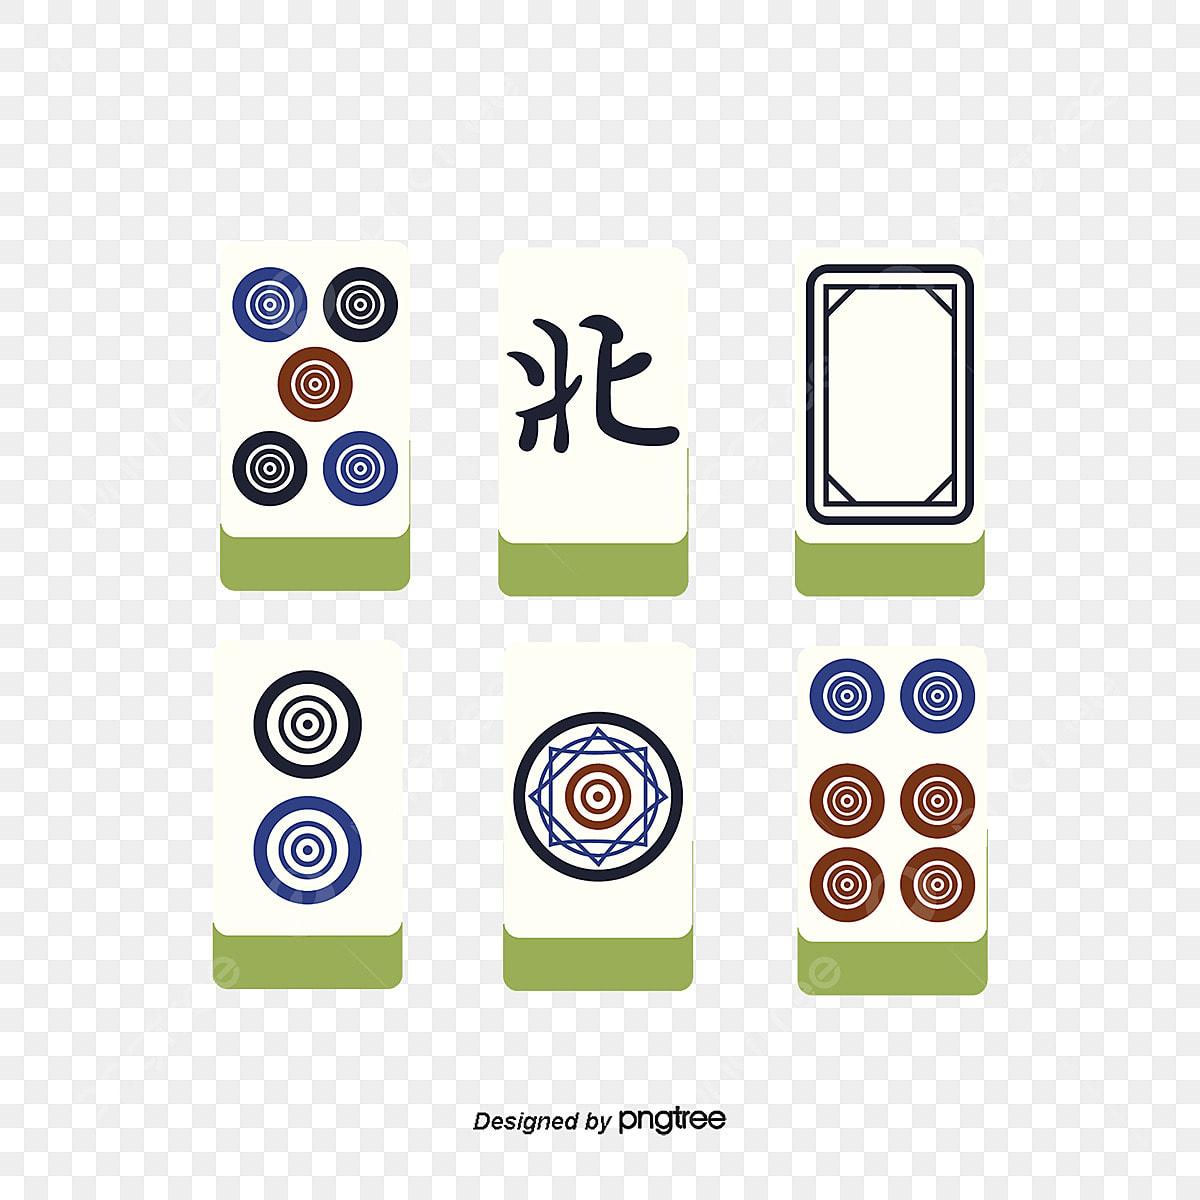 Mahjong Collection, Mahjong, Game, Hong Kong PNG Transparent